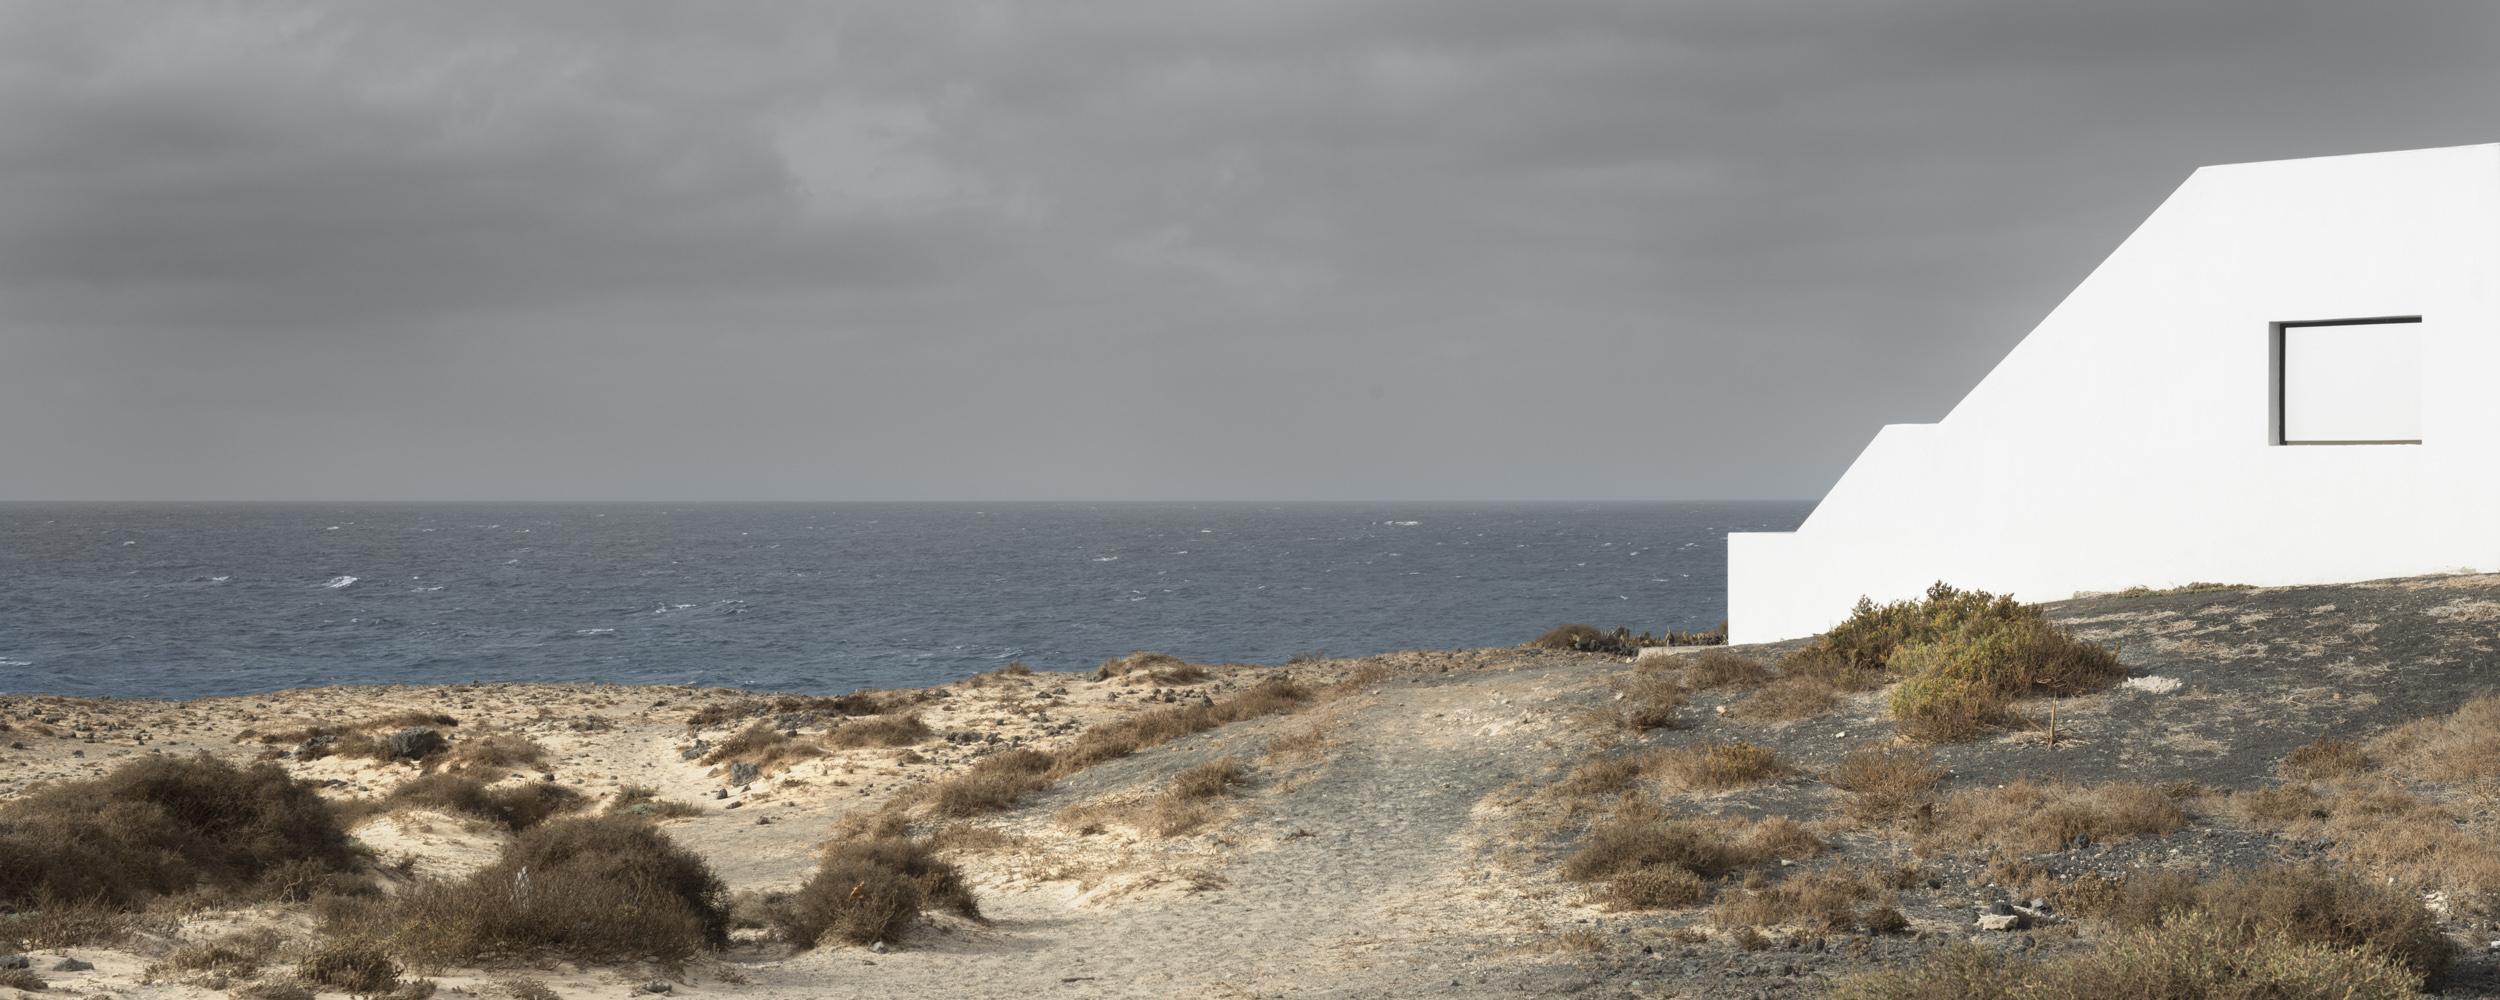 window in white  - THE ISLAND OF THE HORIZON - cesar azcarate, fotografia